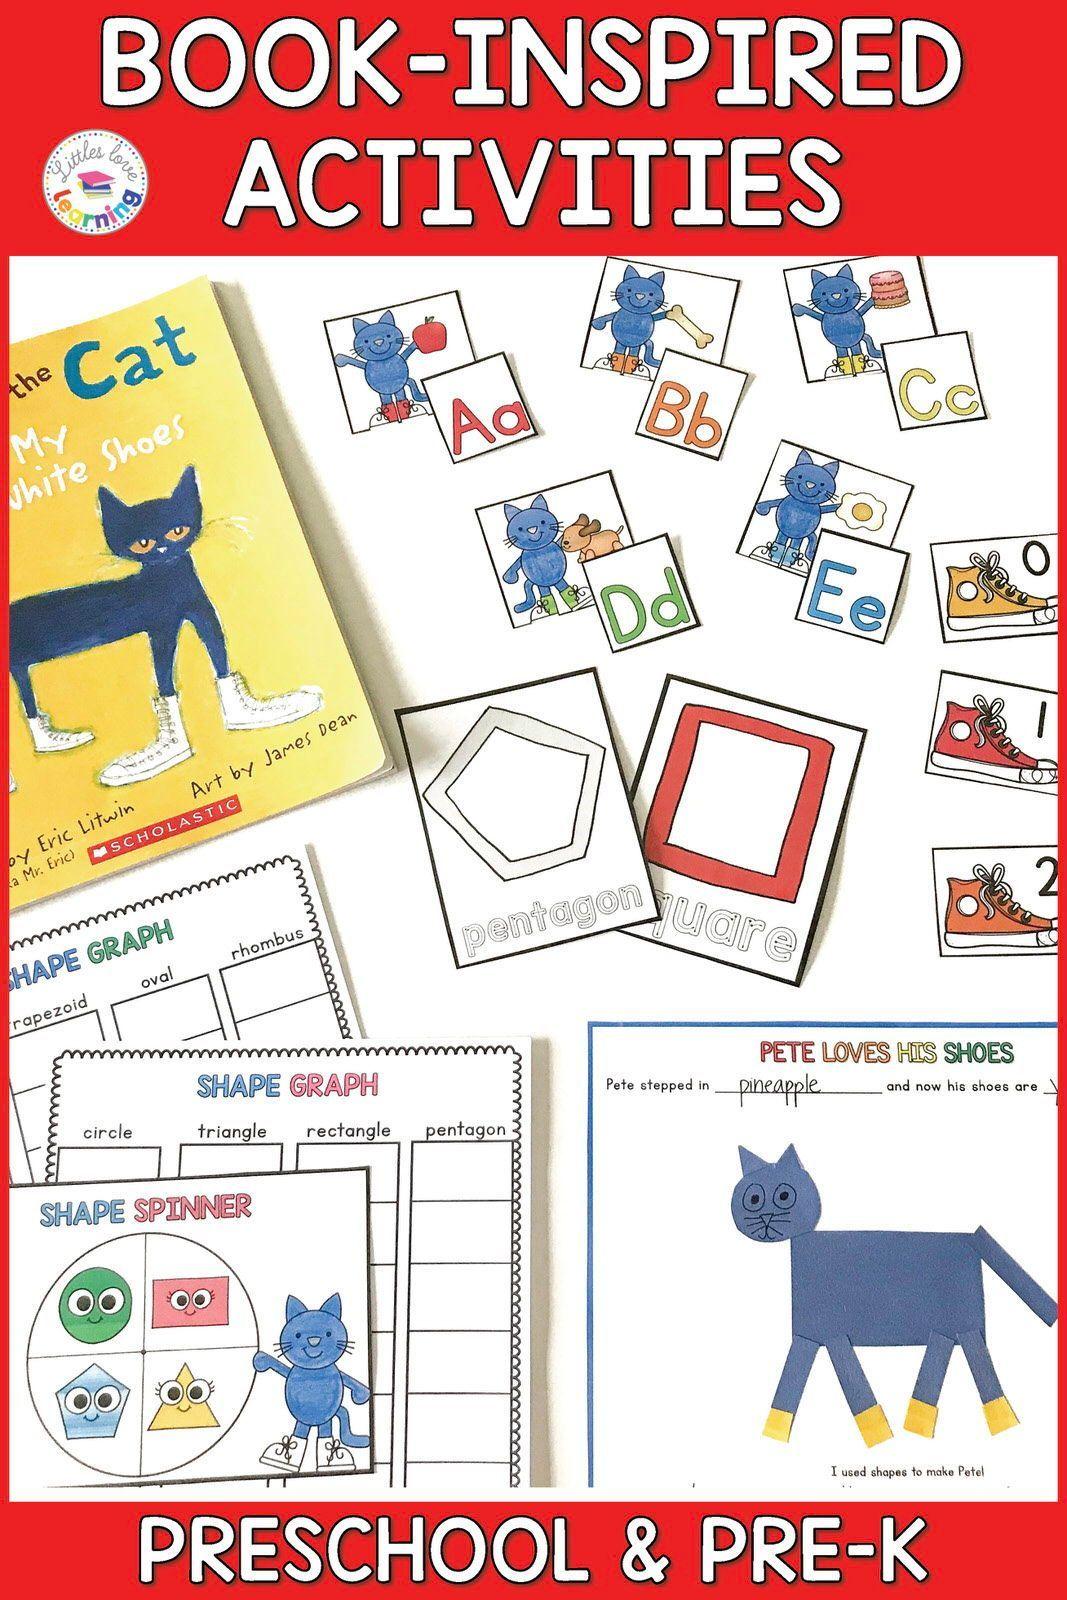 Super Groovy Pete The Cat Activities For Preschool And